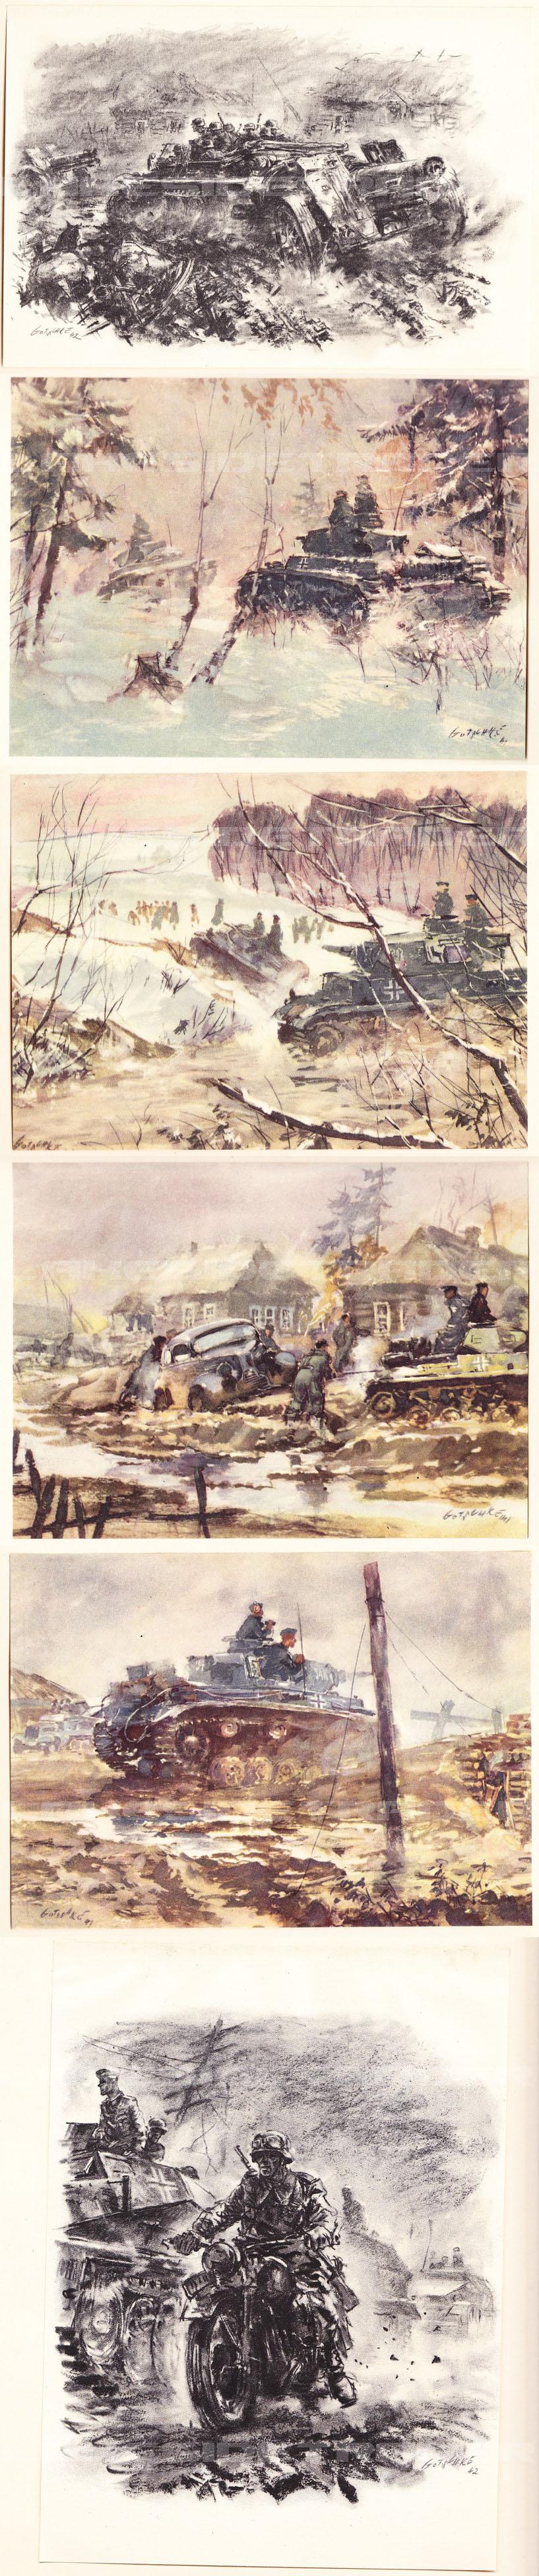 Panzergrenadiere Artwork Album by Gotsihke 1942